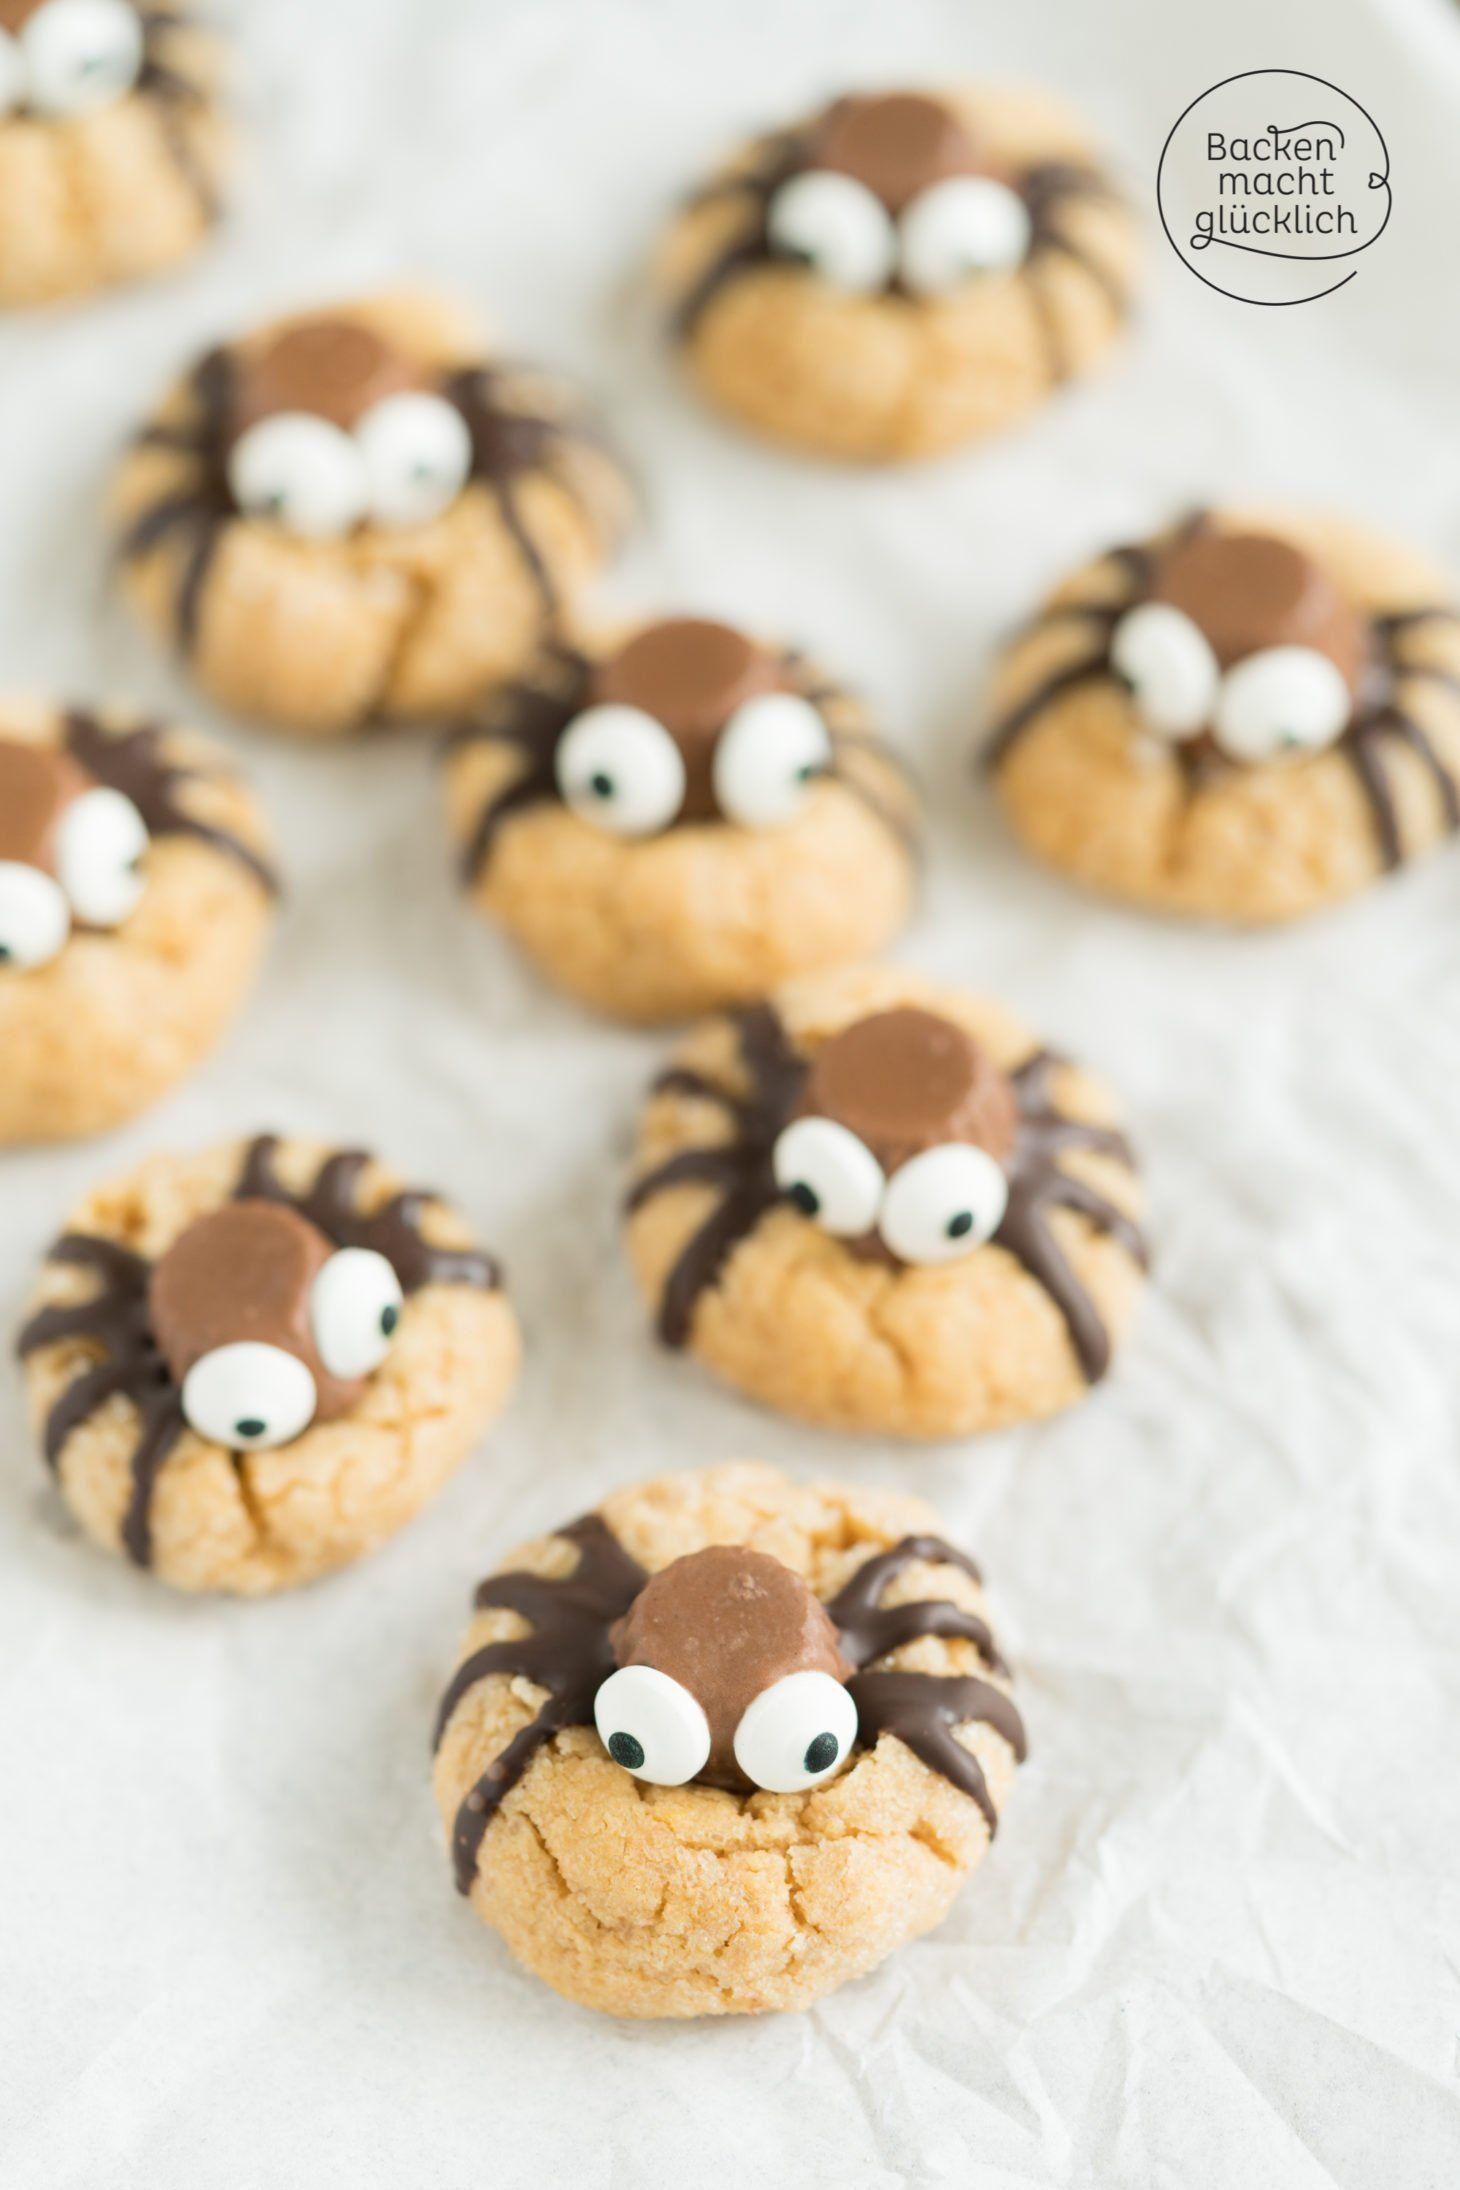 SpinnenCookies Rezept Halloween backen, Backen macht